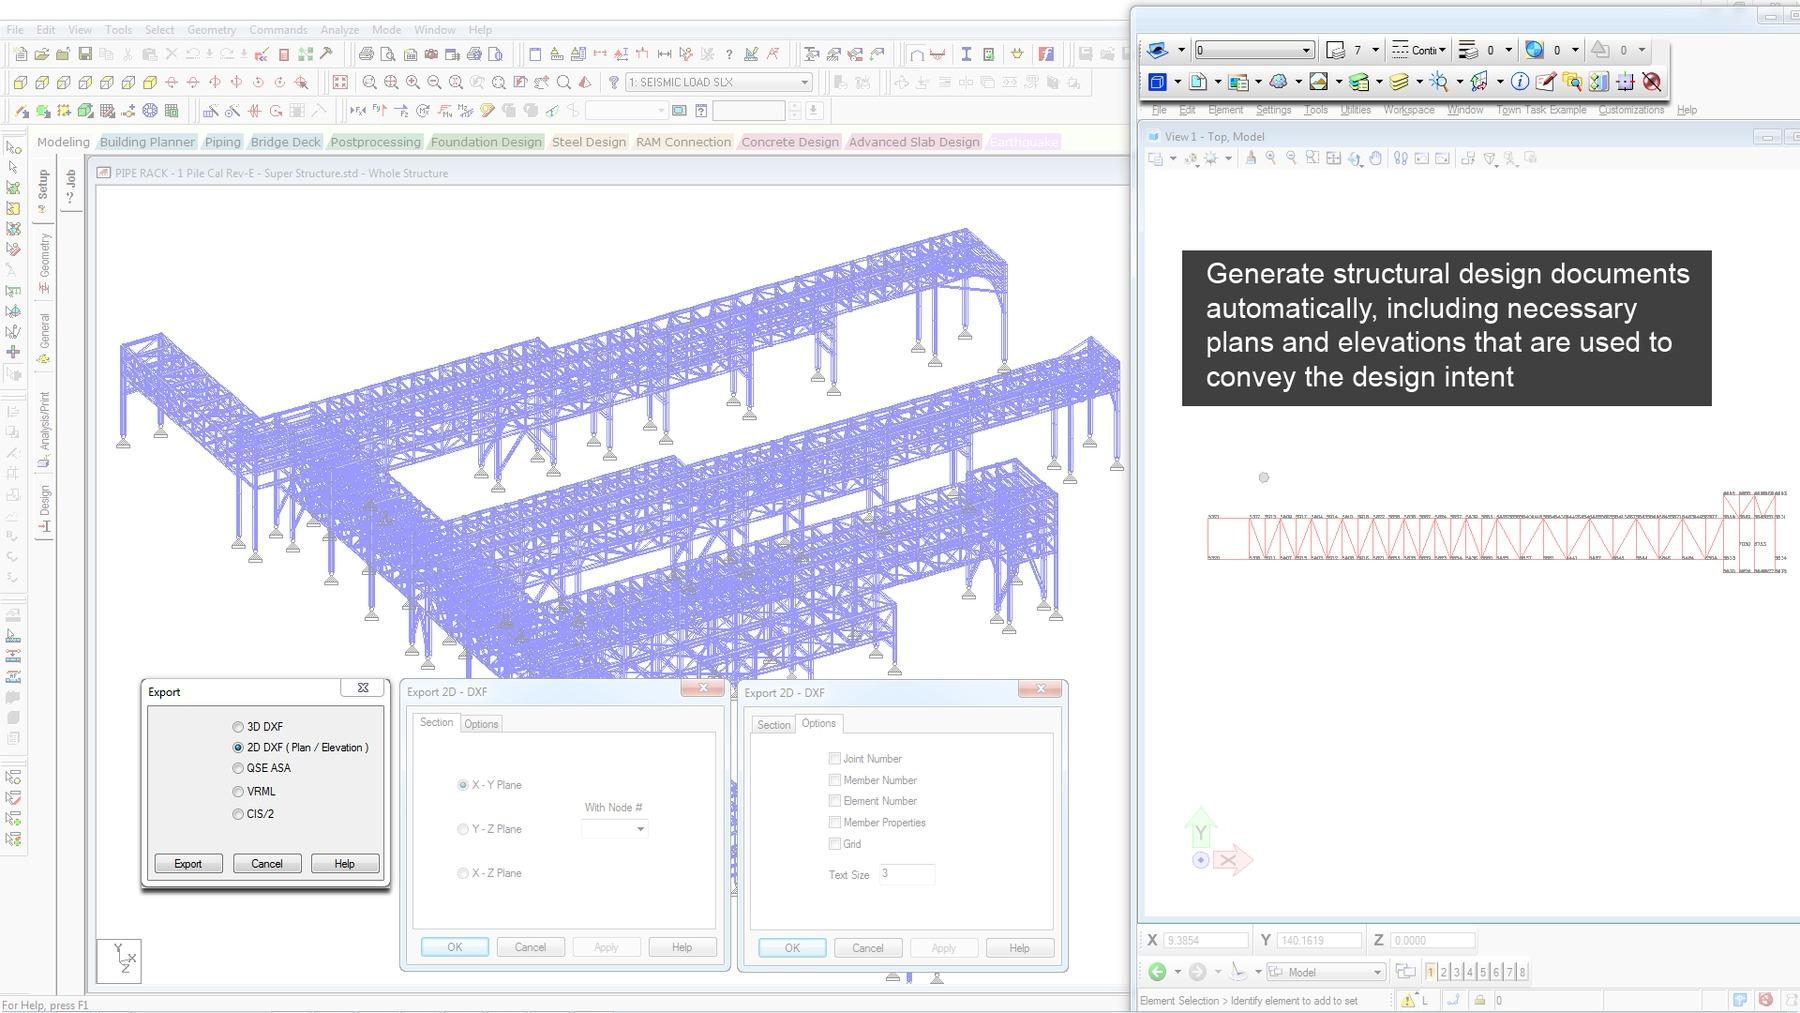 Produce structural design documentation